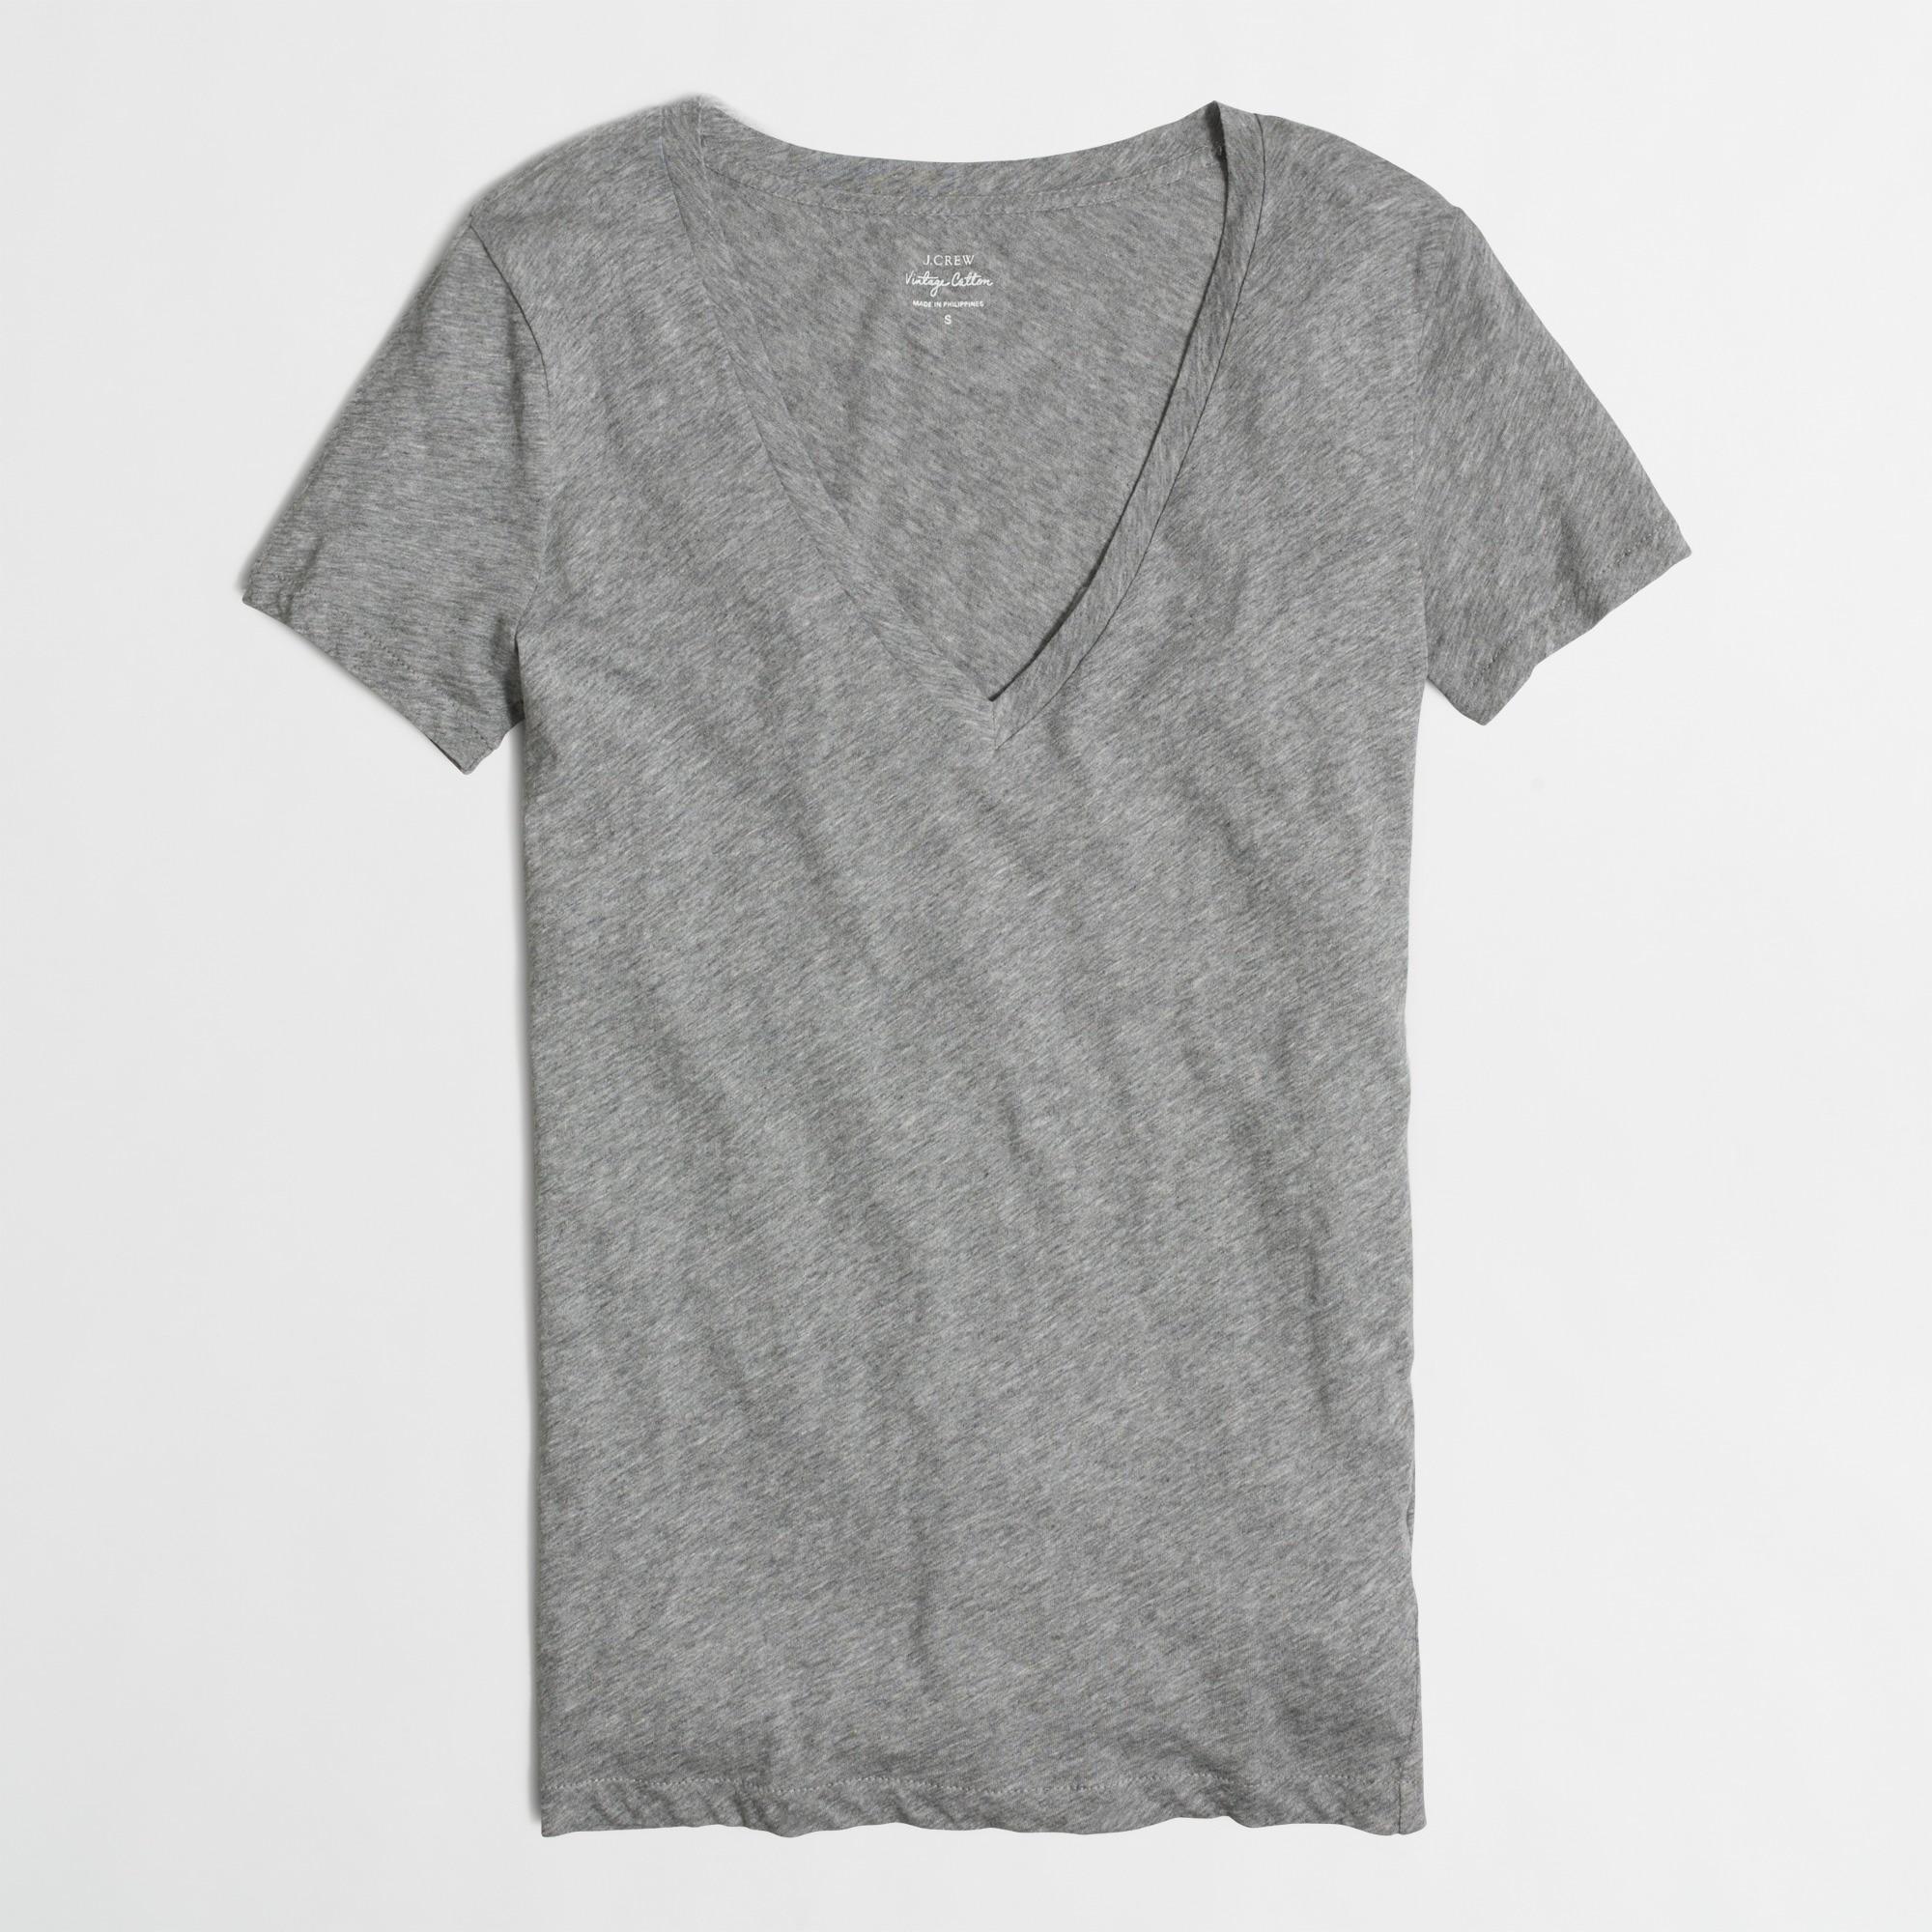 J.Crew Mercantile Featherweight Slub Cotton T-shirt   search